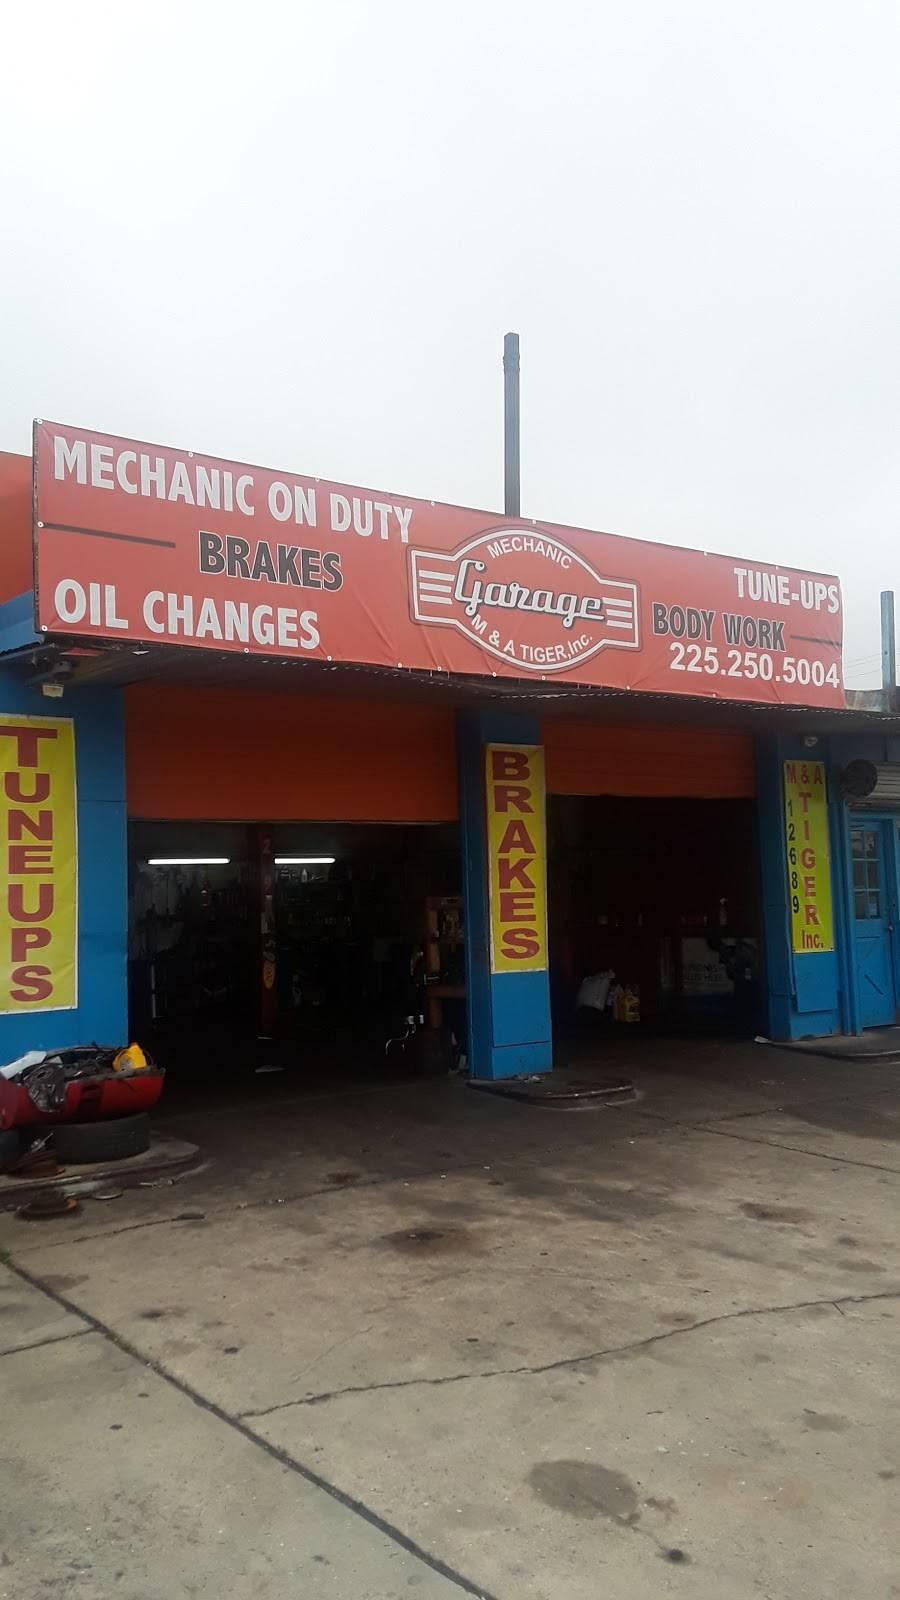 M&A Tiger inc mechanic shop - car repair  | Photo 5 of 5 | Address: 12689 Florida Blvd, Baton Rouge, LA 70815, USA | Phone: (225) 250-5004